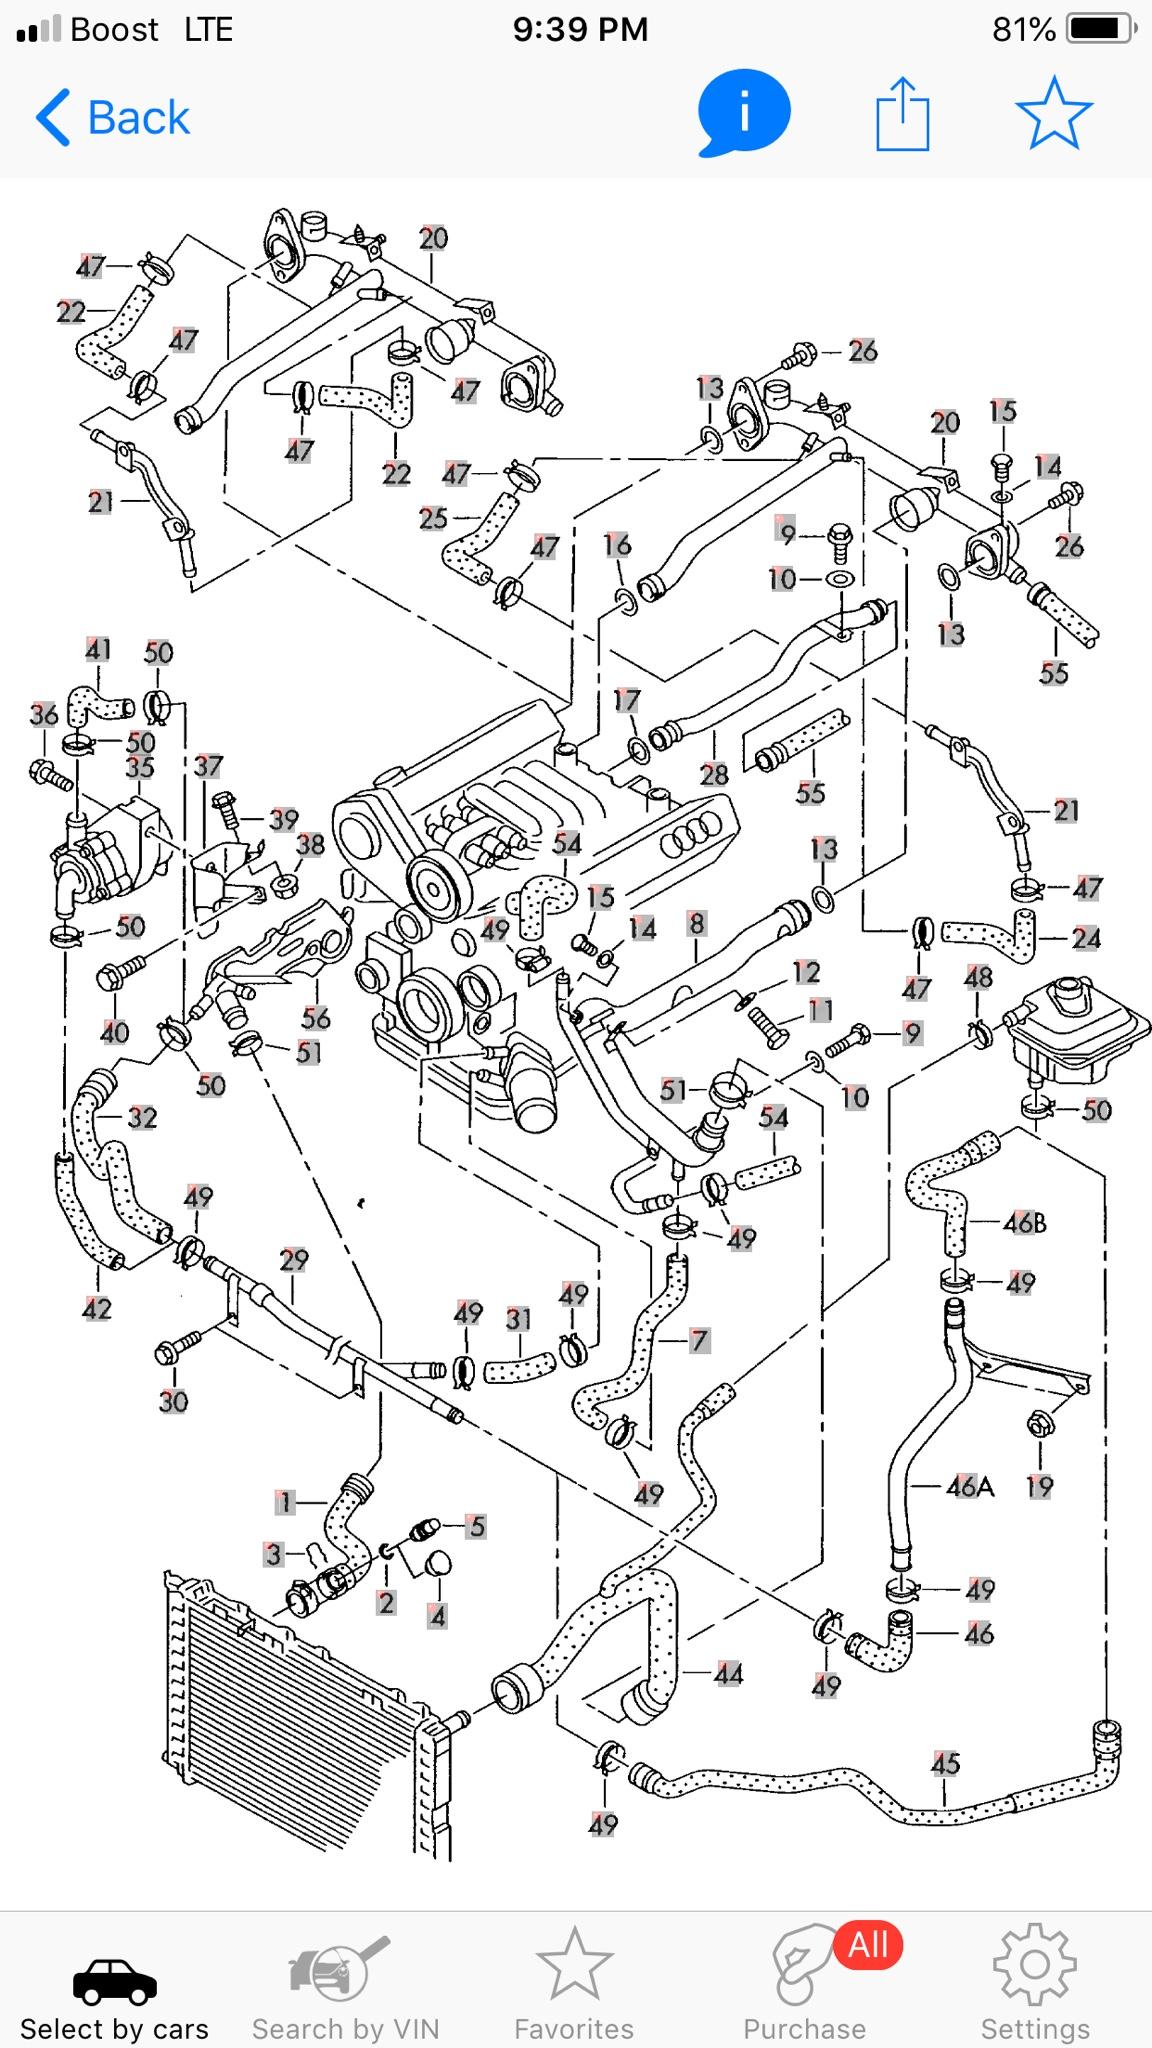 Audi A4 B5 2 8l Coolant Leak Without Car Running